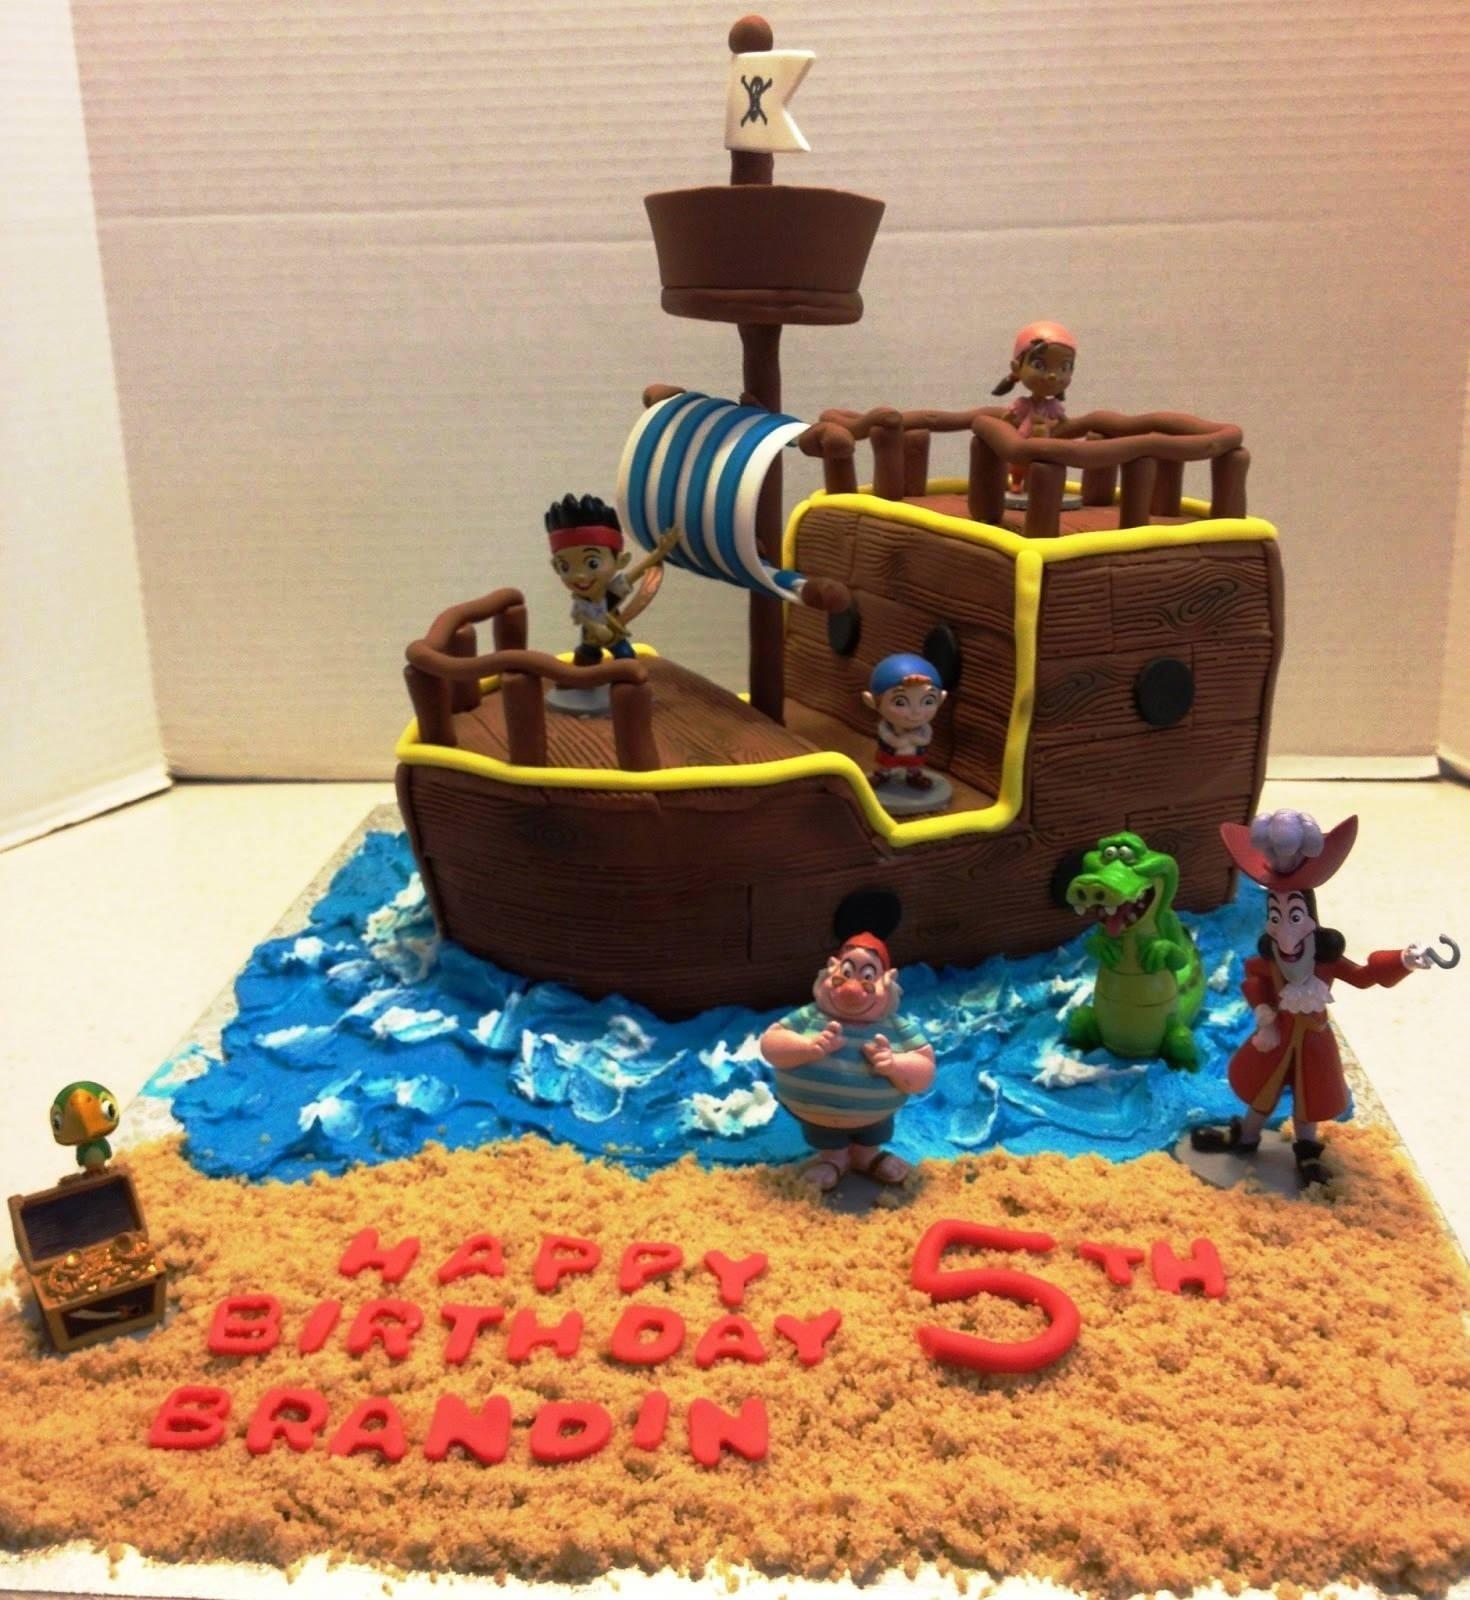 10 Nice Jake And The Neverland Pirate Cake Ideas picture of jake and the neverland pirates birthday cake protoblogr 2 2020